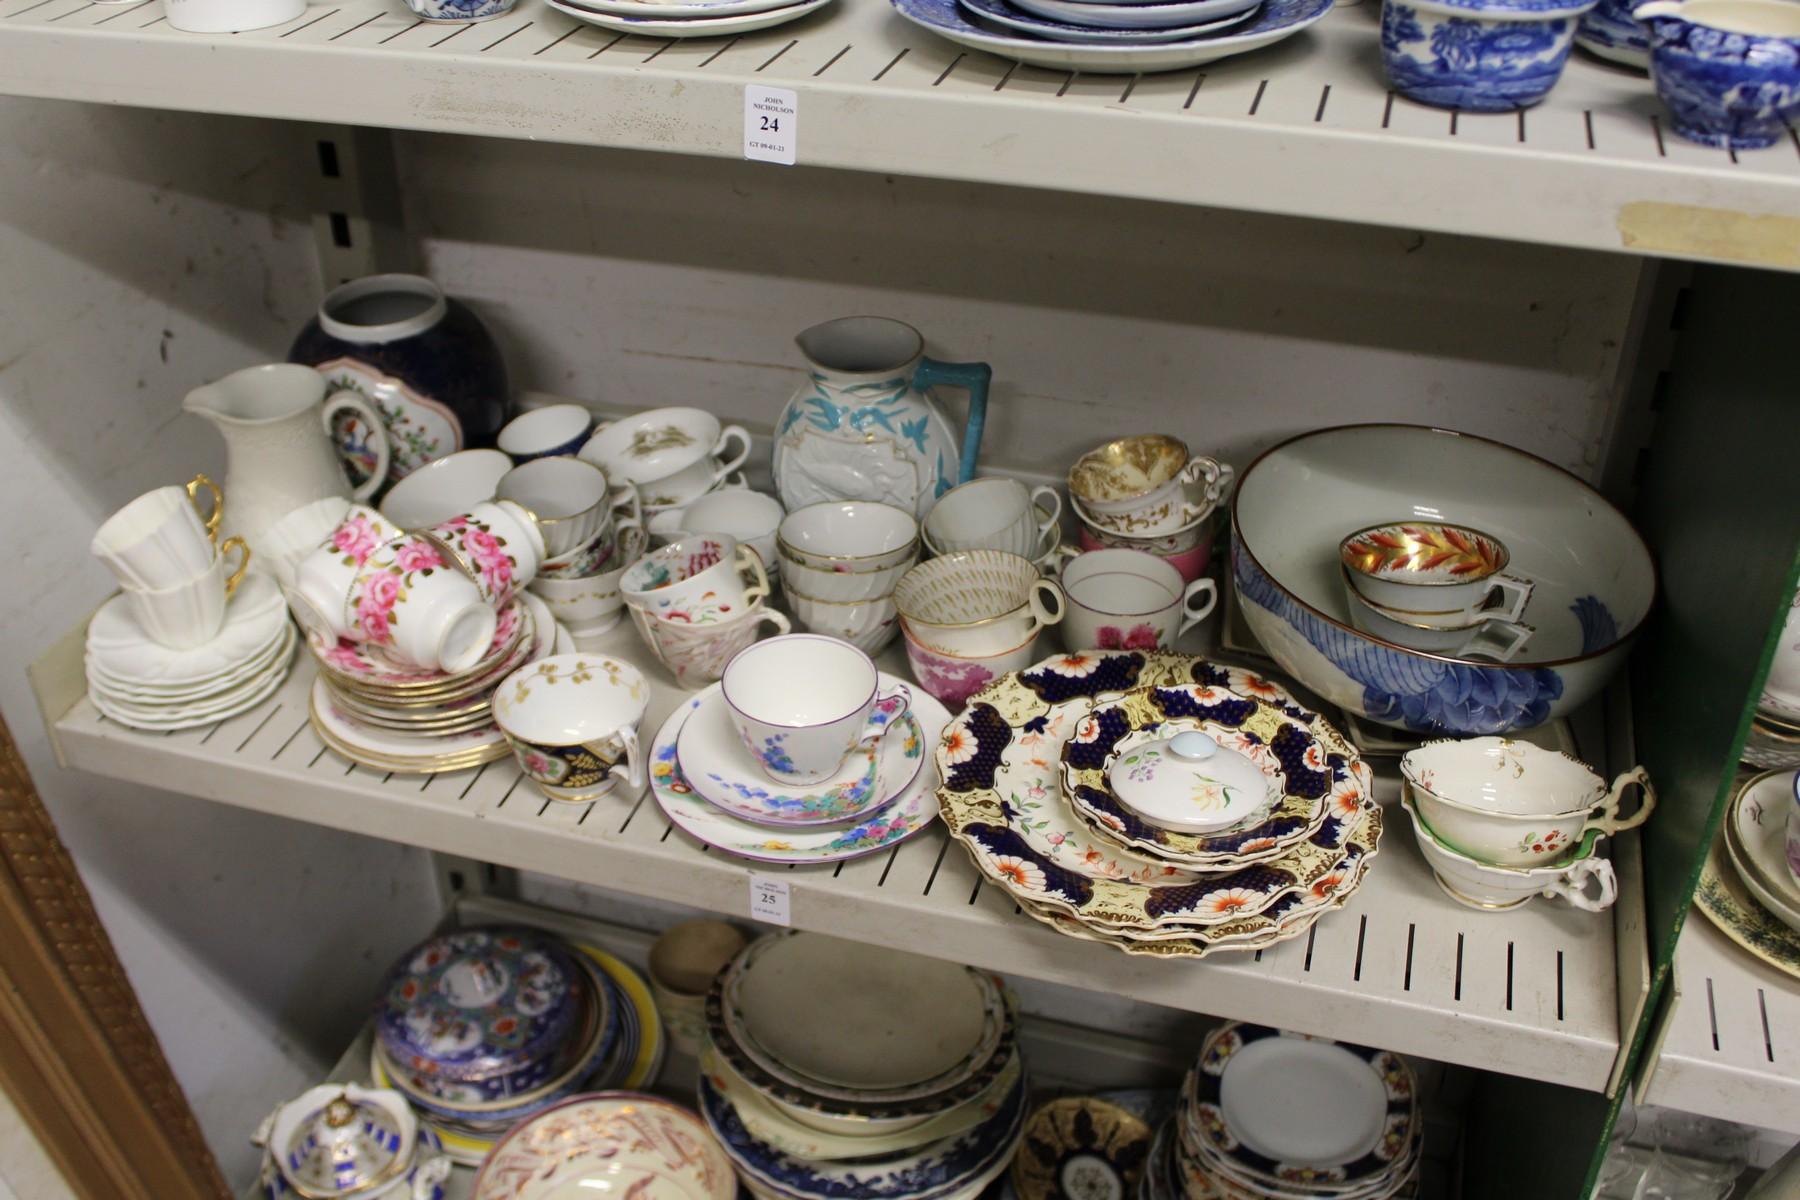 Decorative tea ware etc. - Image 2 of 2